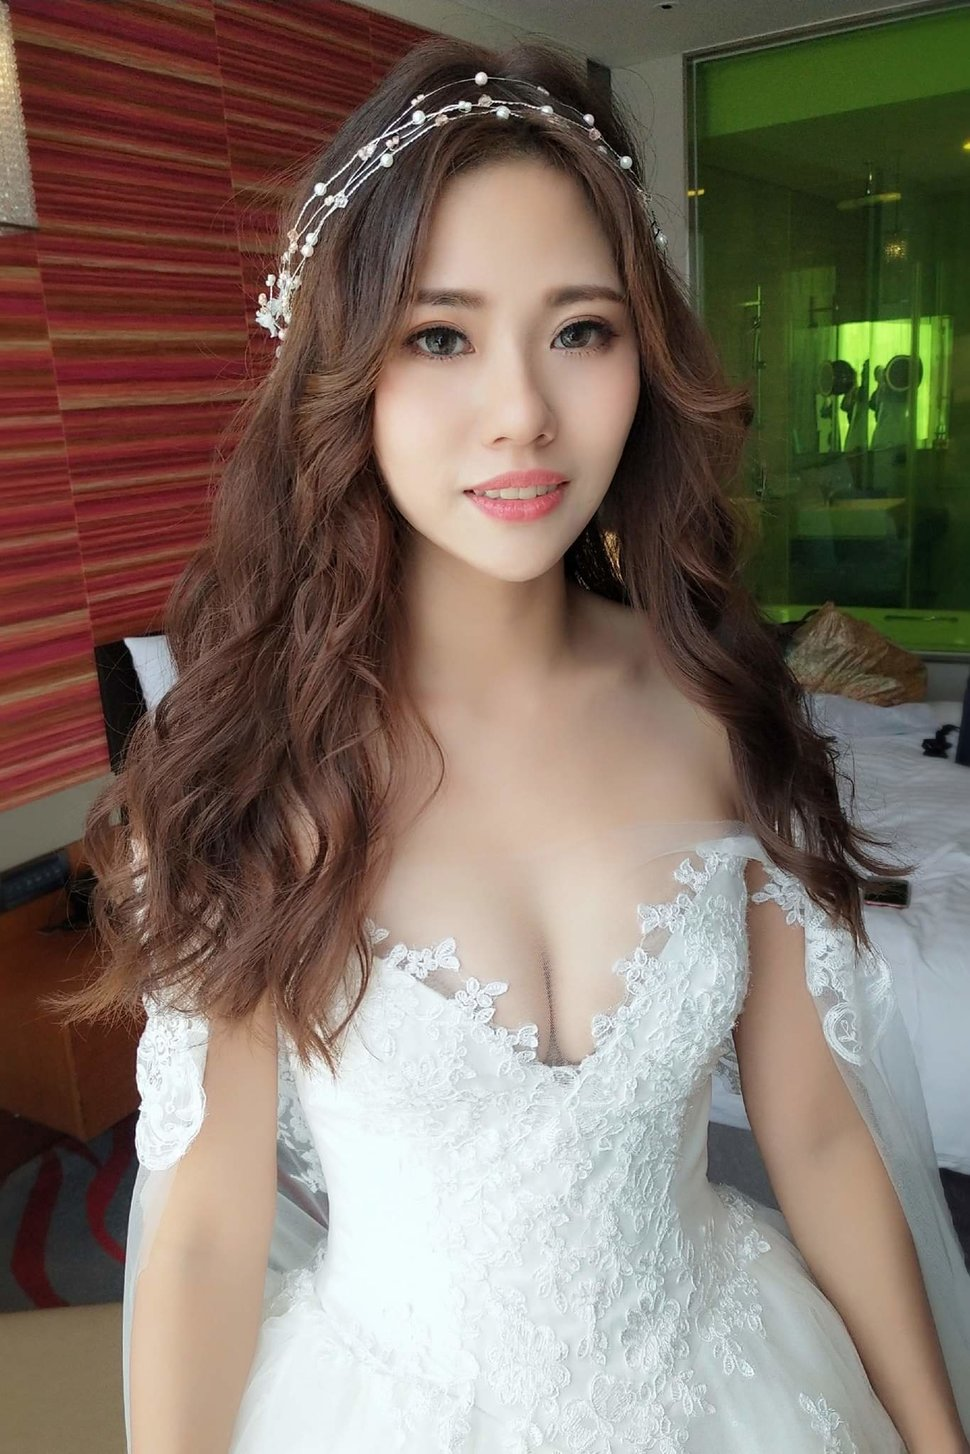 FB_IMG_1570879303192 - 苗栗新秘Livy/新竹新秘/台中新秘《結婚吧》